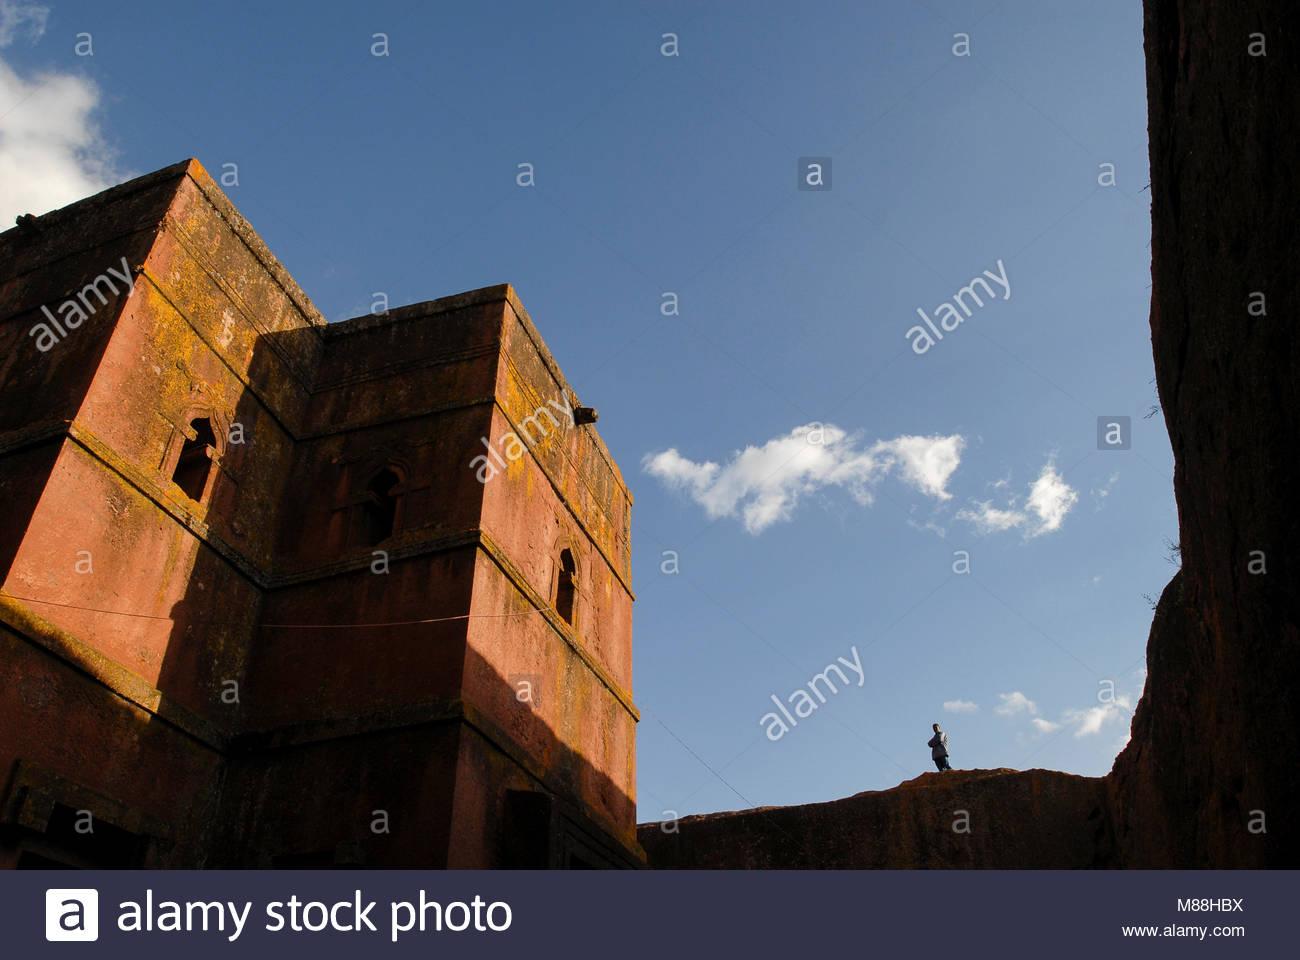 ethiopia amhara region lalibela monolith rock churches built by king M88HBX